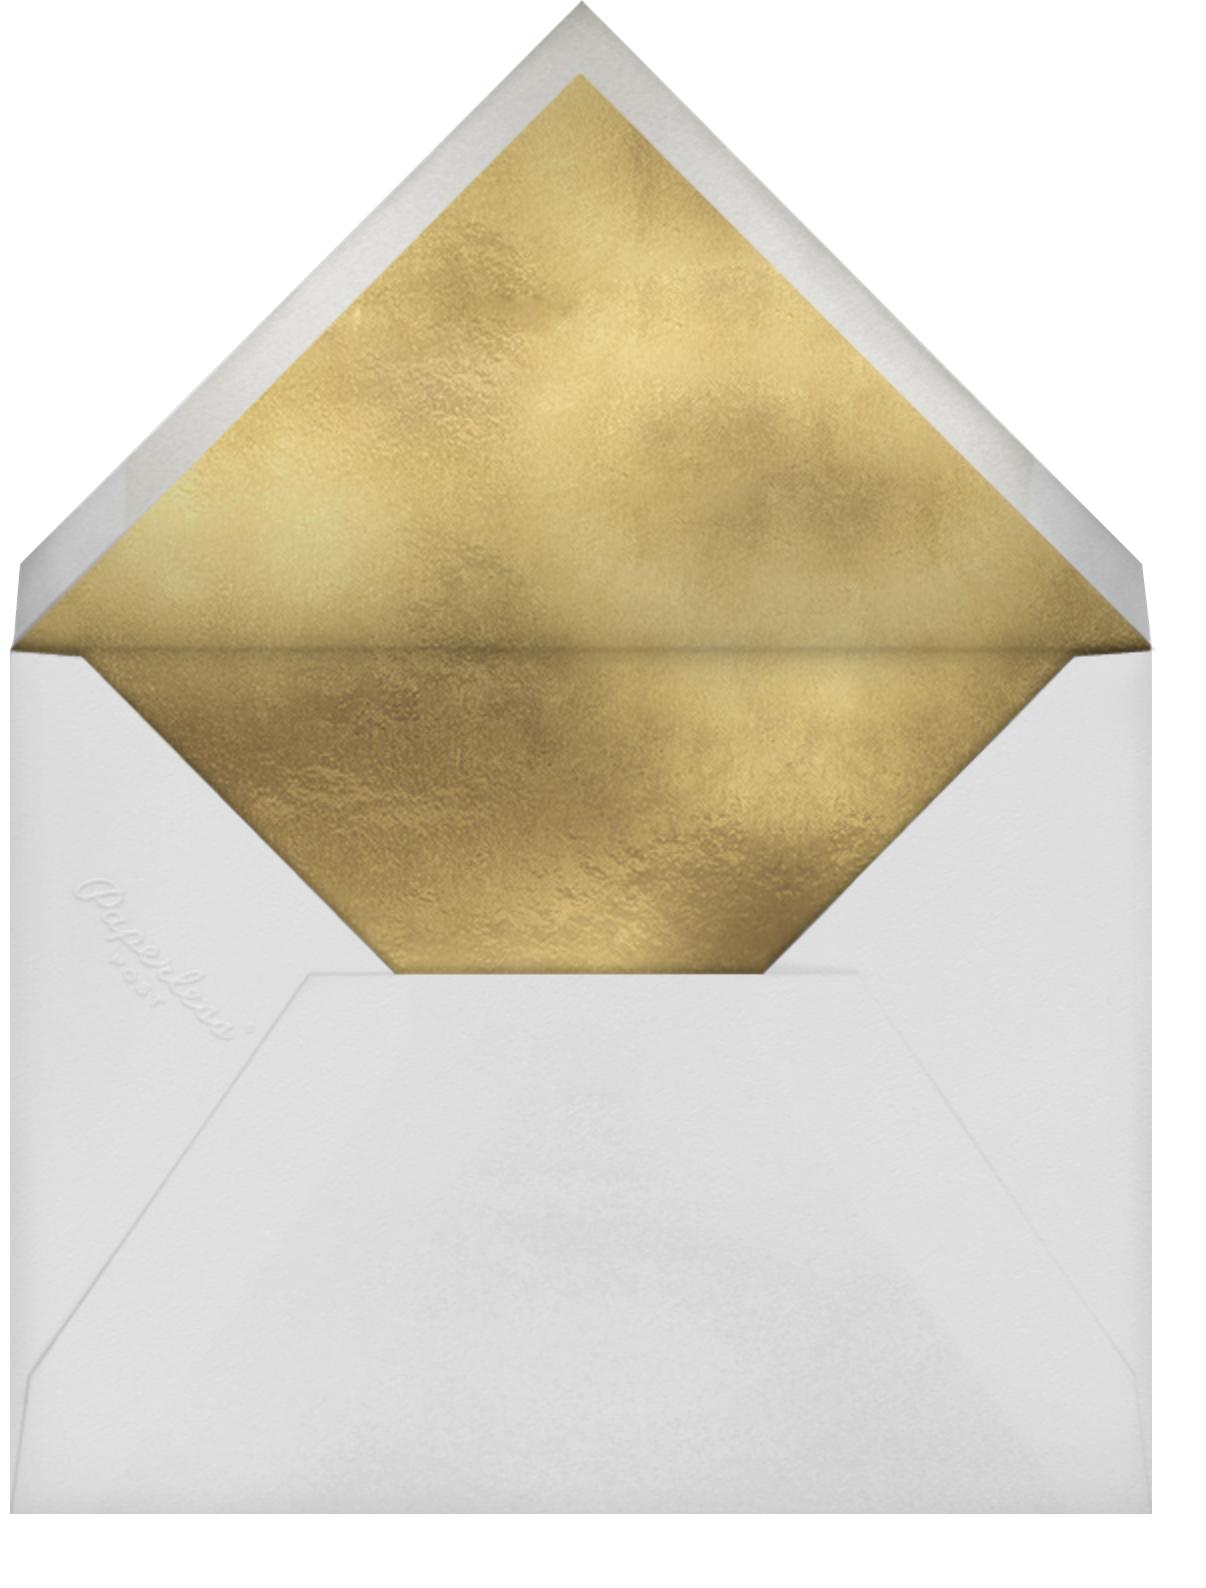 Striped Tulips - White - Oscar de la Renta - Envelope